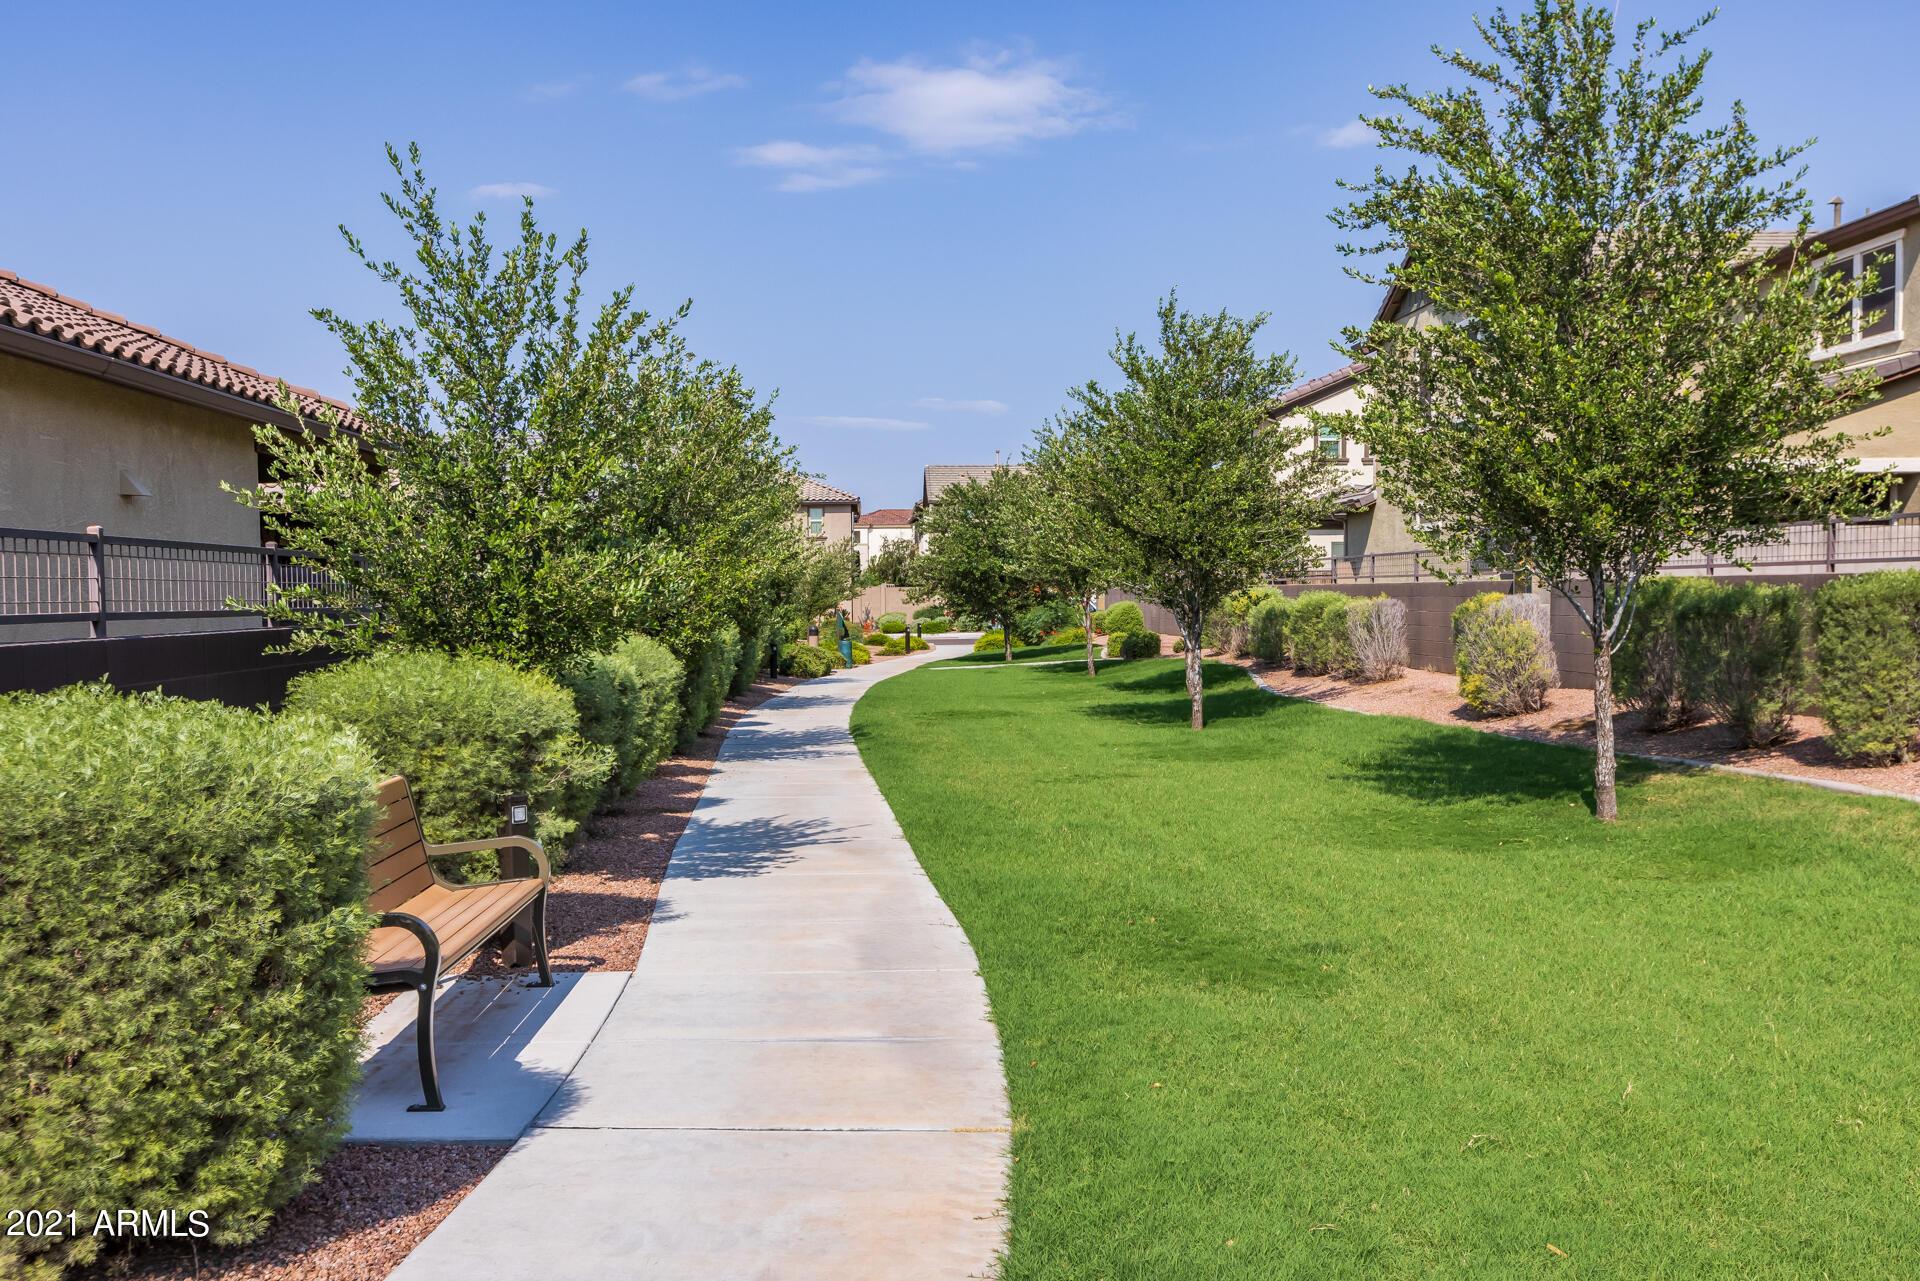 MLS 6293705 2916 S WASHINGTON Street, Chandler, AZ 85286 Community Pool